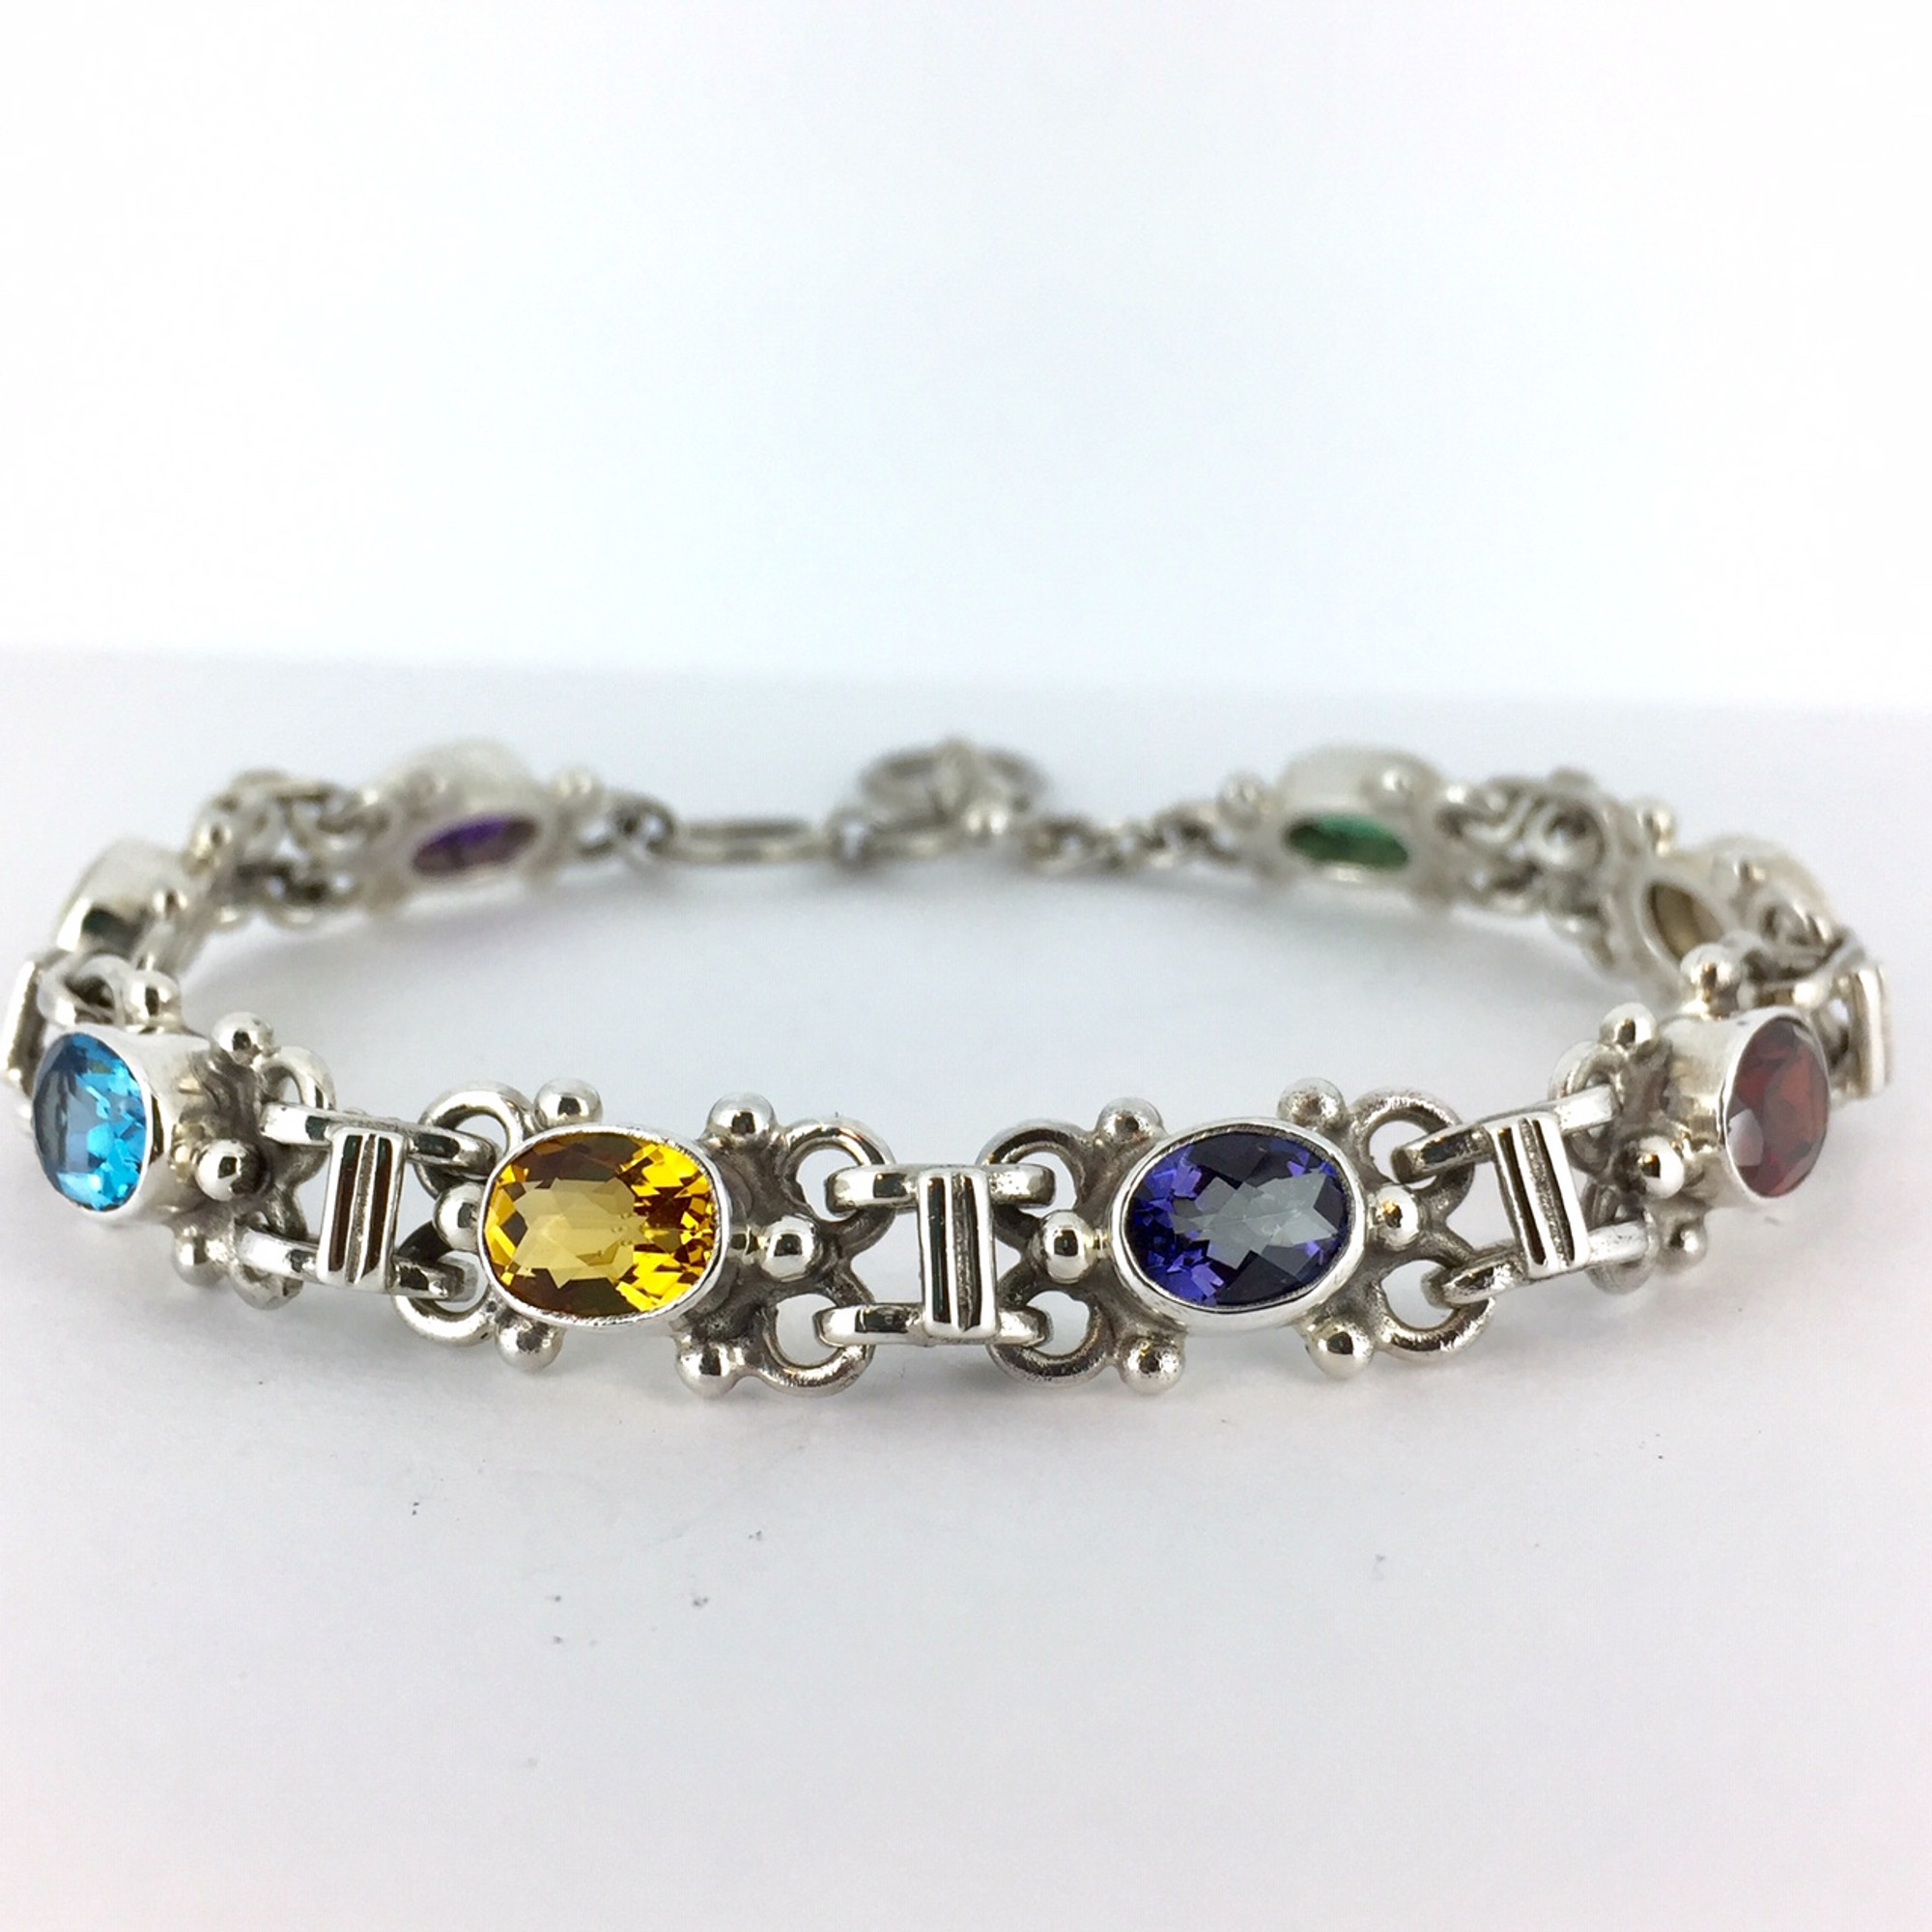 7aebb3249 Multi Stone Bali Sterling Silver Toggle Bracelet - Mima's Of Warwick, LLC